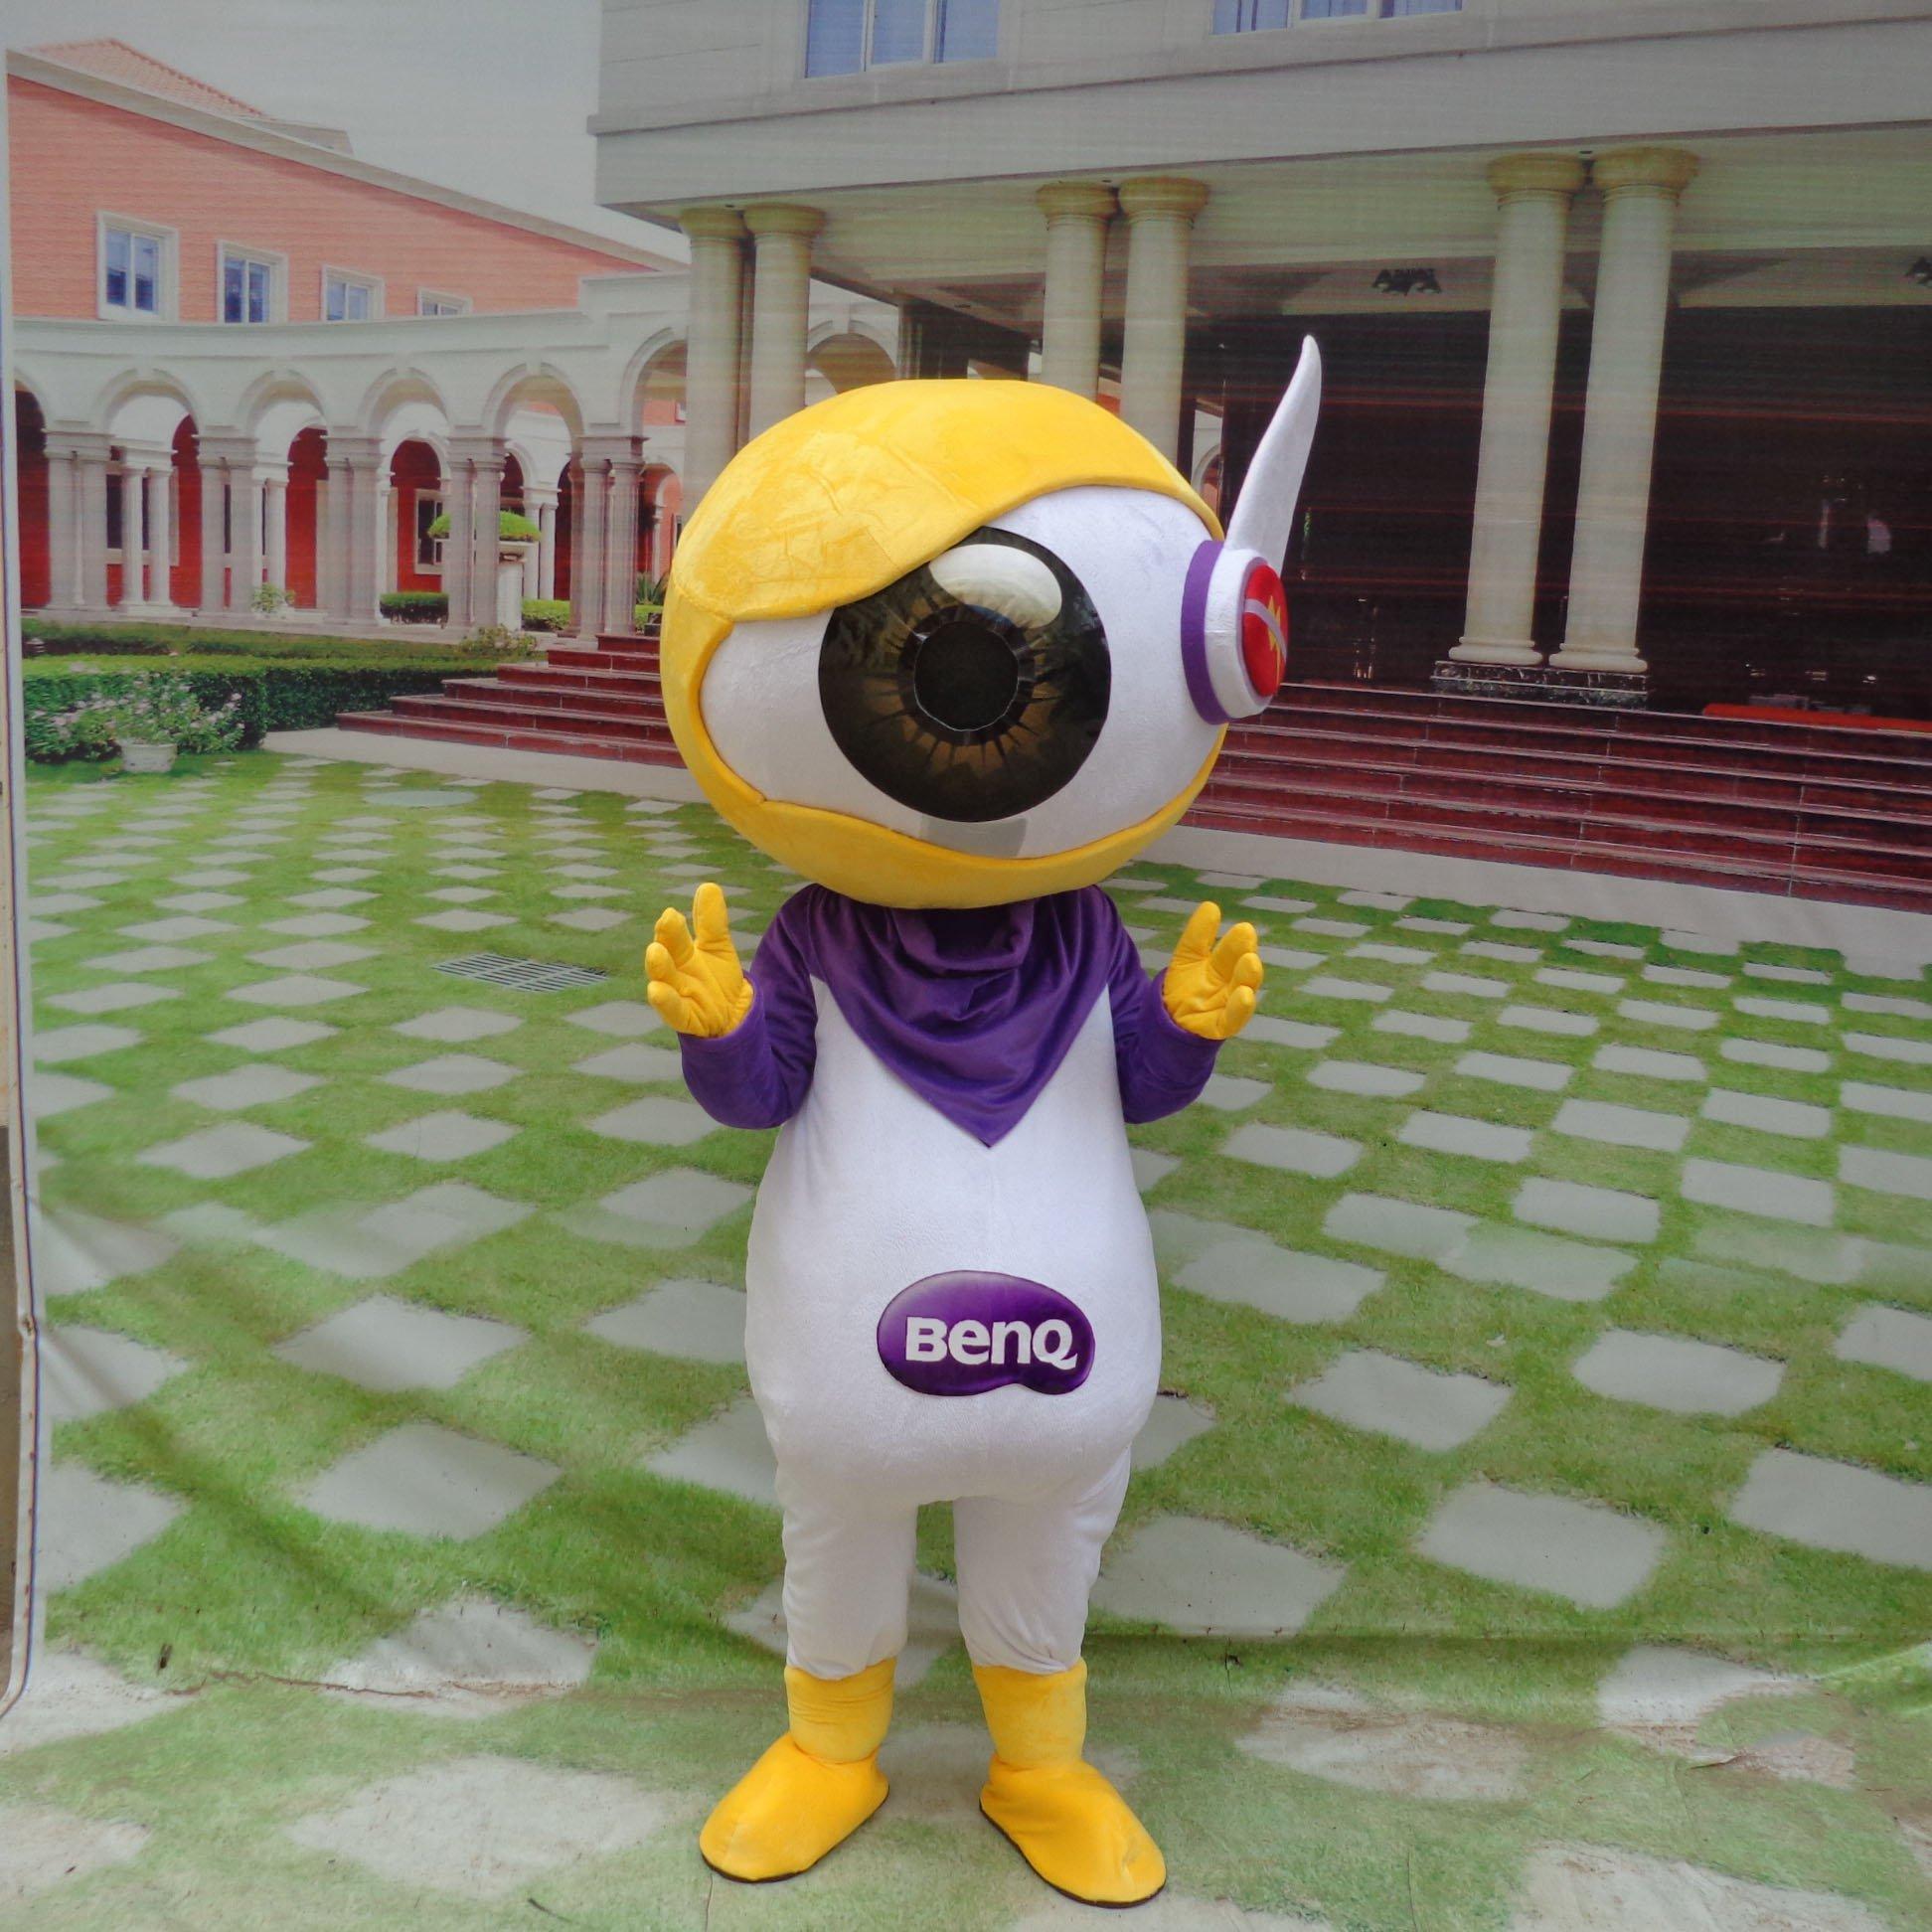 Cartoon Doll Clothing Cartoon Walking Doll Clothing Cartoon Show Clothing Cartoon Dolls Doll Clothing Mascot Costume